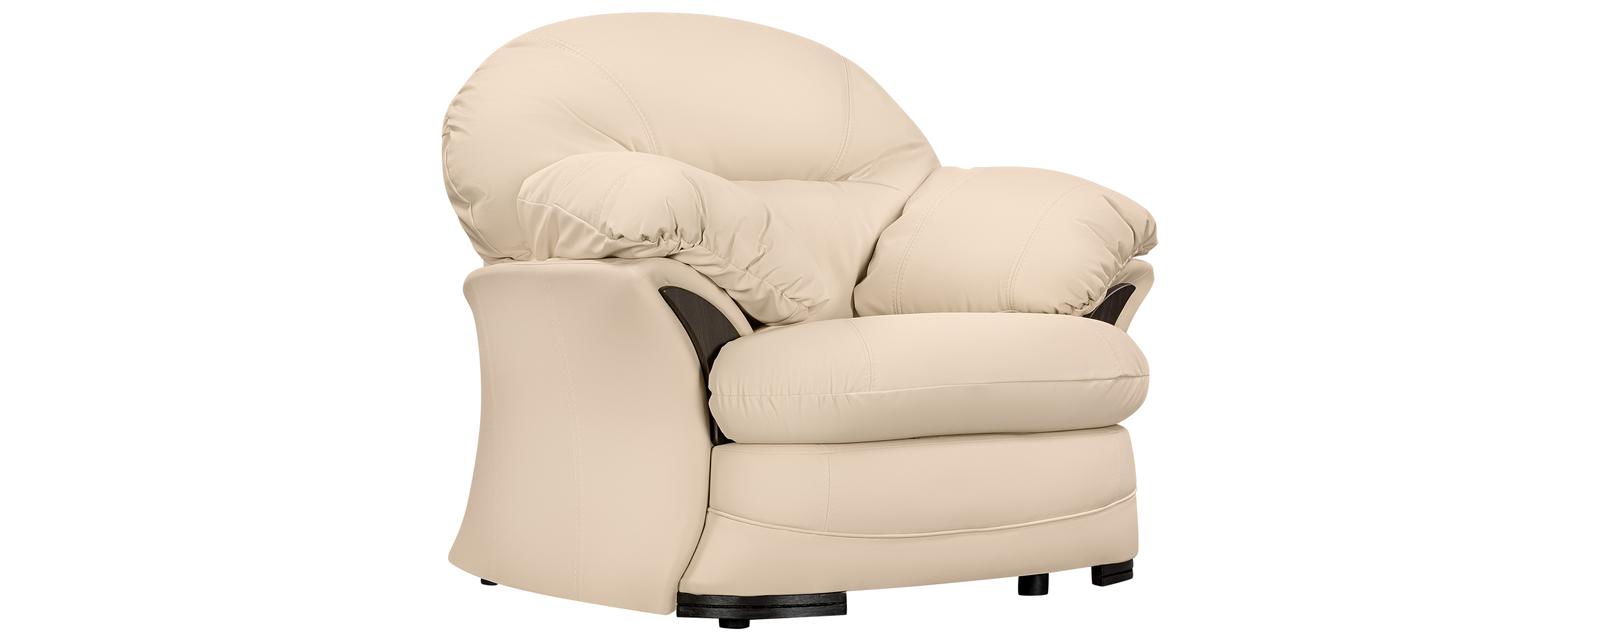 Кресло кожаное HomeMe Ланкастер AAA0043007